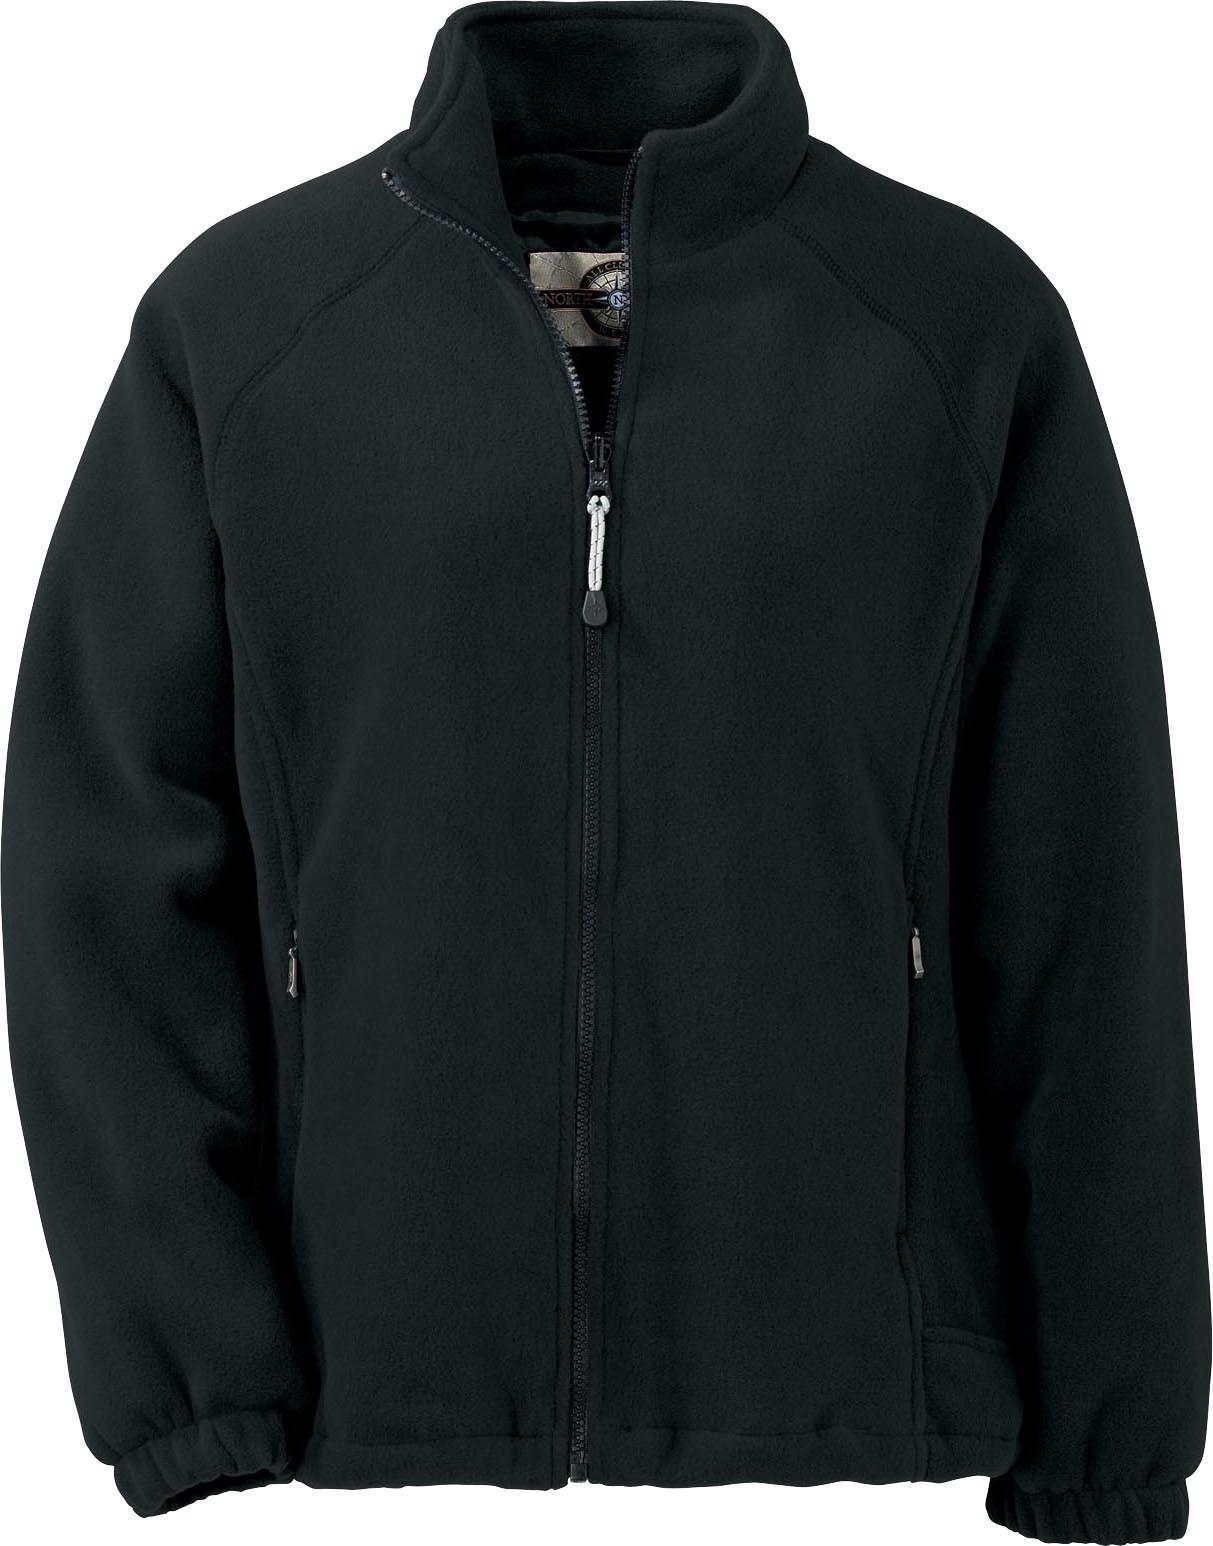 big sale 5ae2e d7ad6 Ash City Poly Fleece 78039 - Ladies  Interactive Fleece Jacket  32.35 - Women s  Outerwear